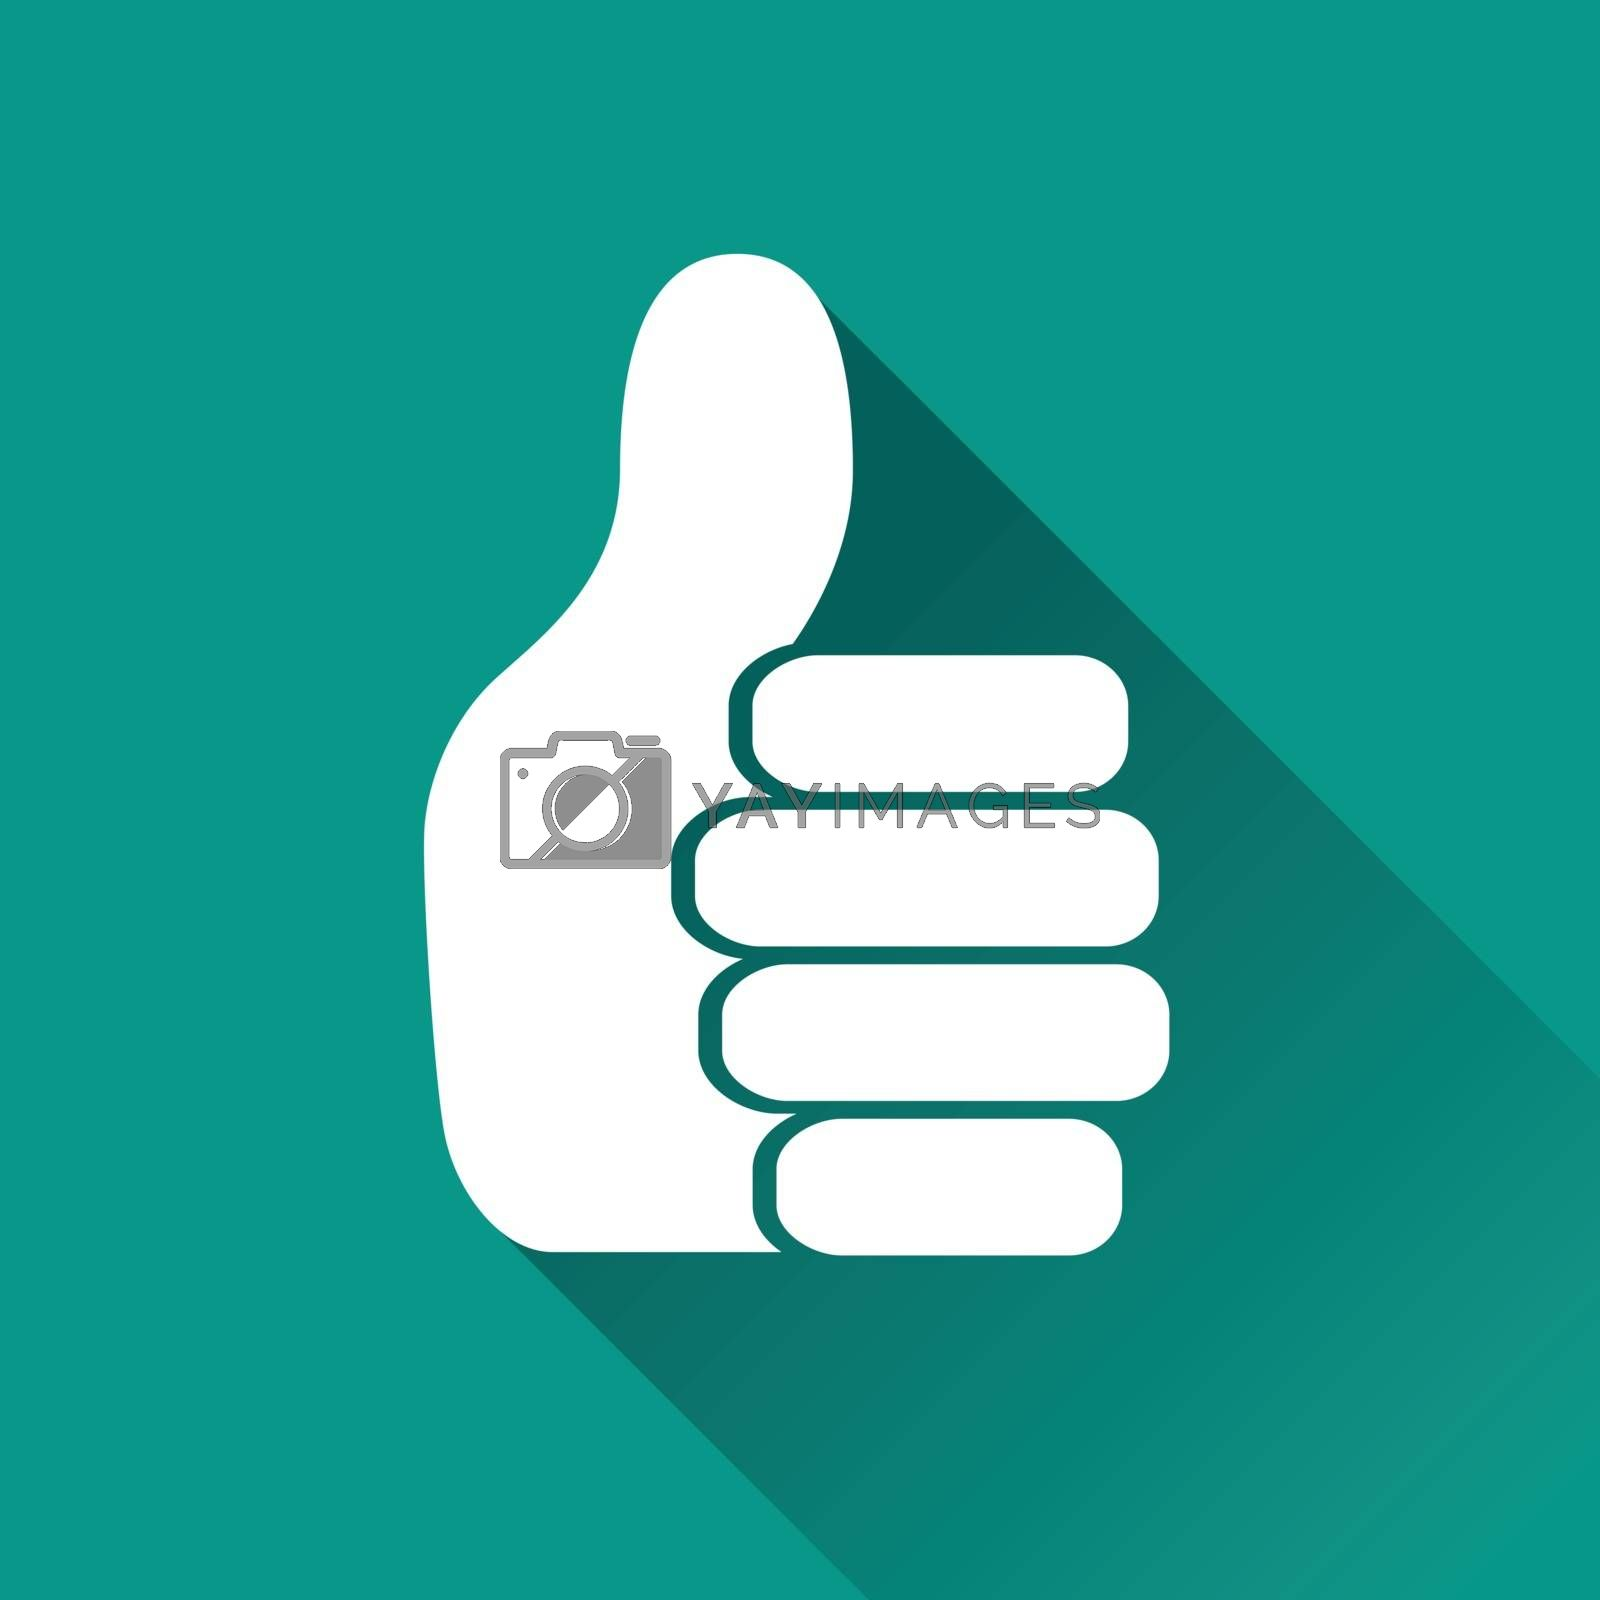 illustration of thumb flat design icon isolated